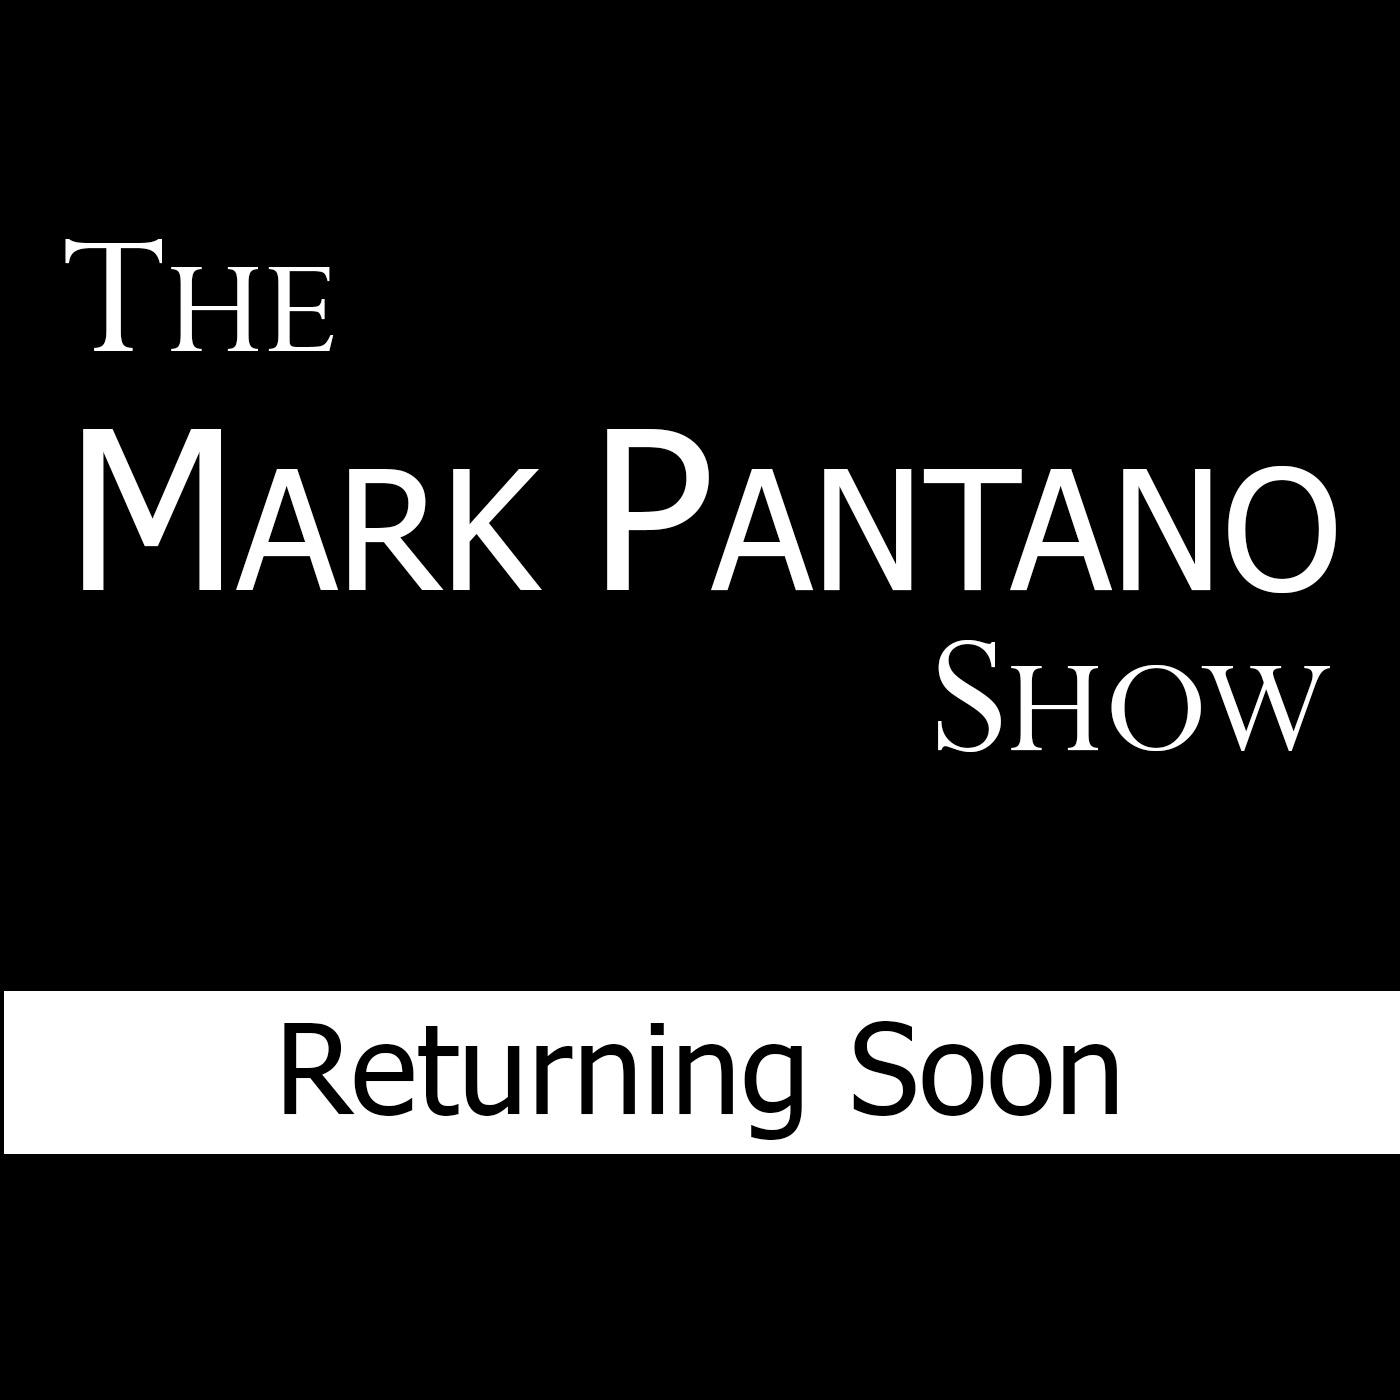 The Mark Pantano Show